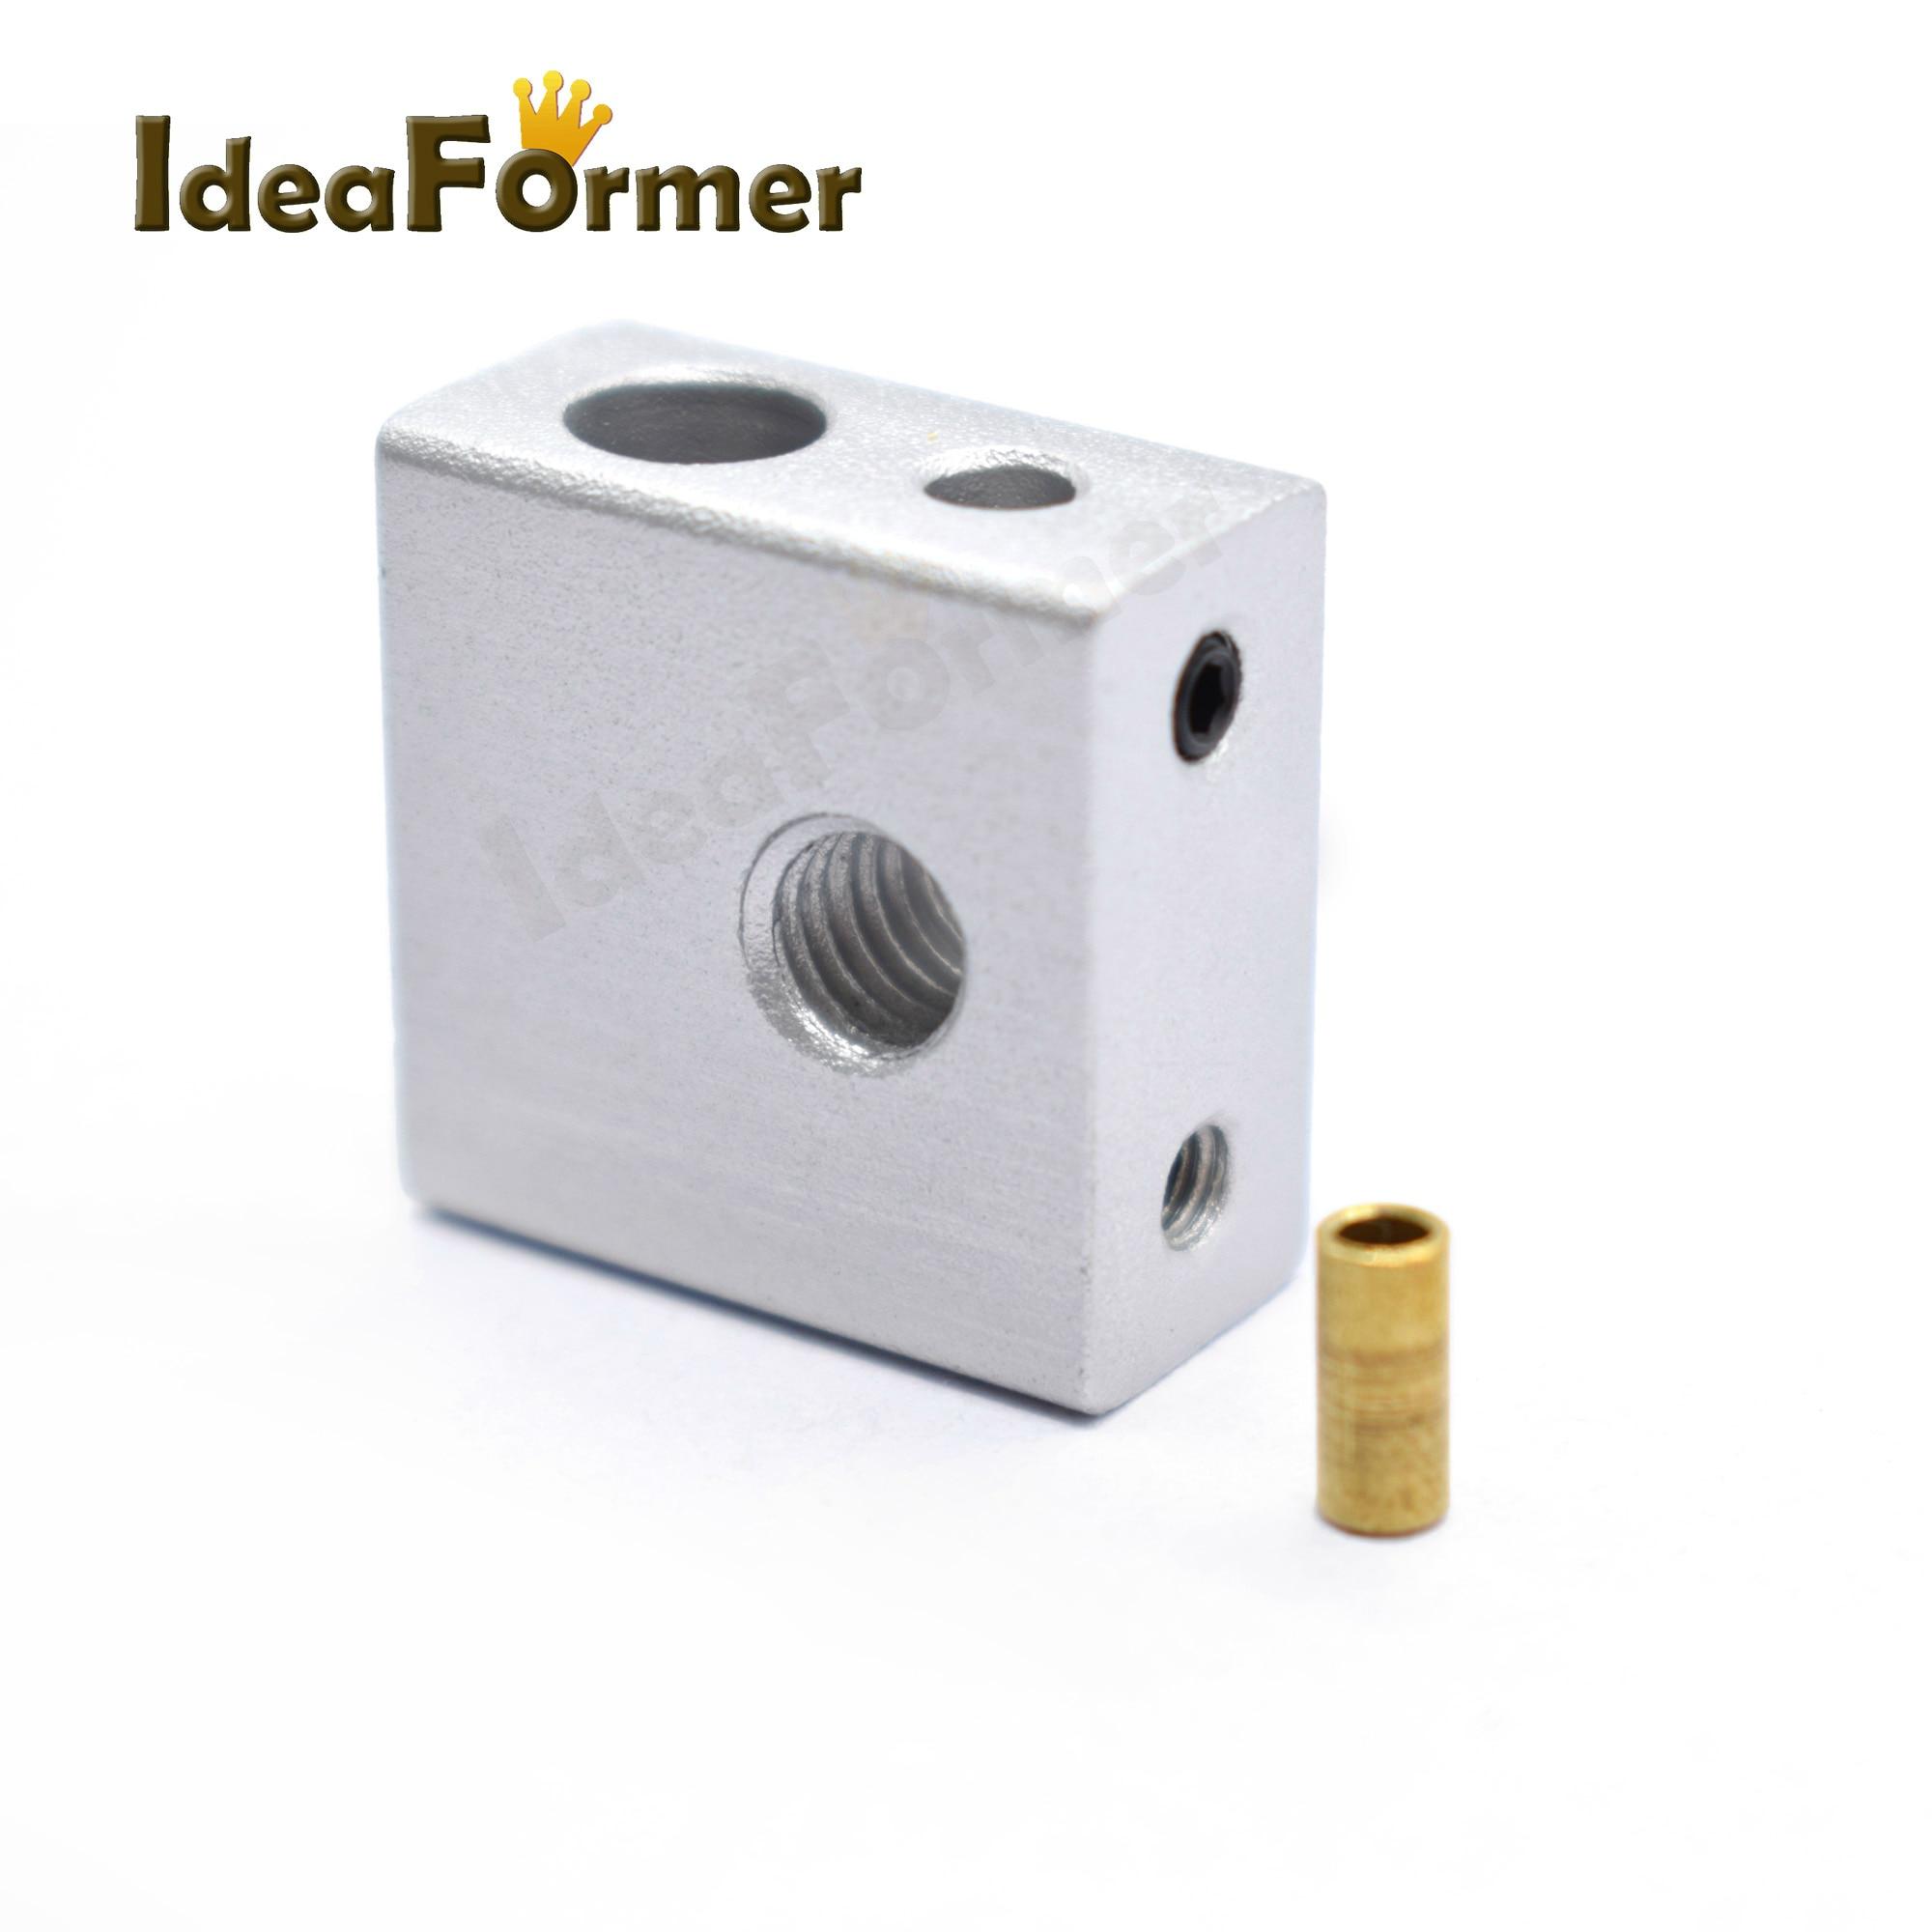 Aluminium Heating Block M6 M3 20*20*10mm Thread For Makerbot MK7//MK8 3D Printer